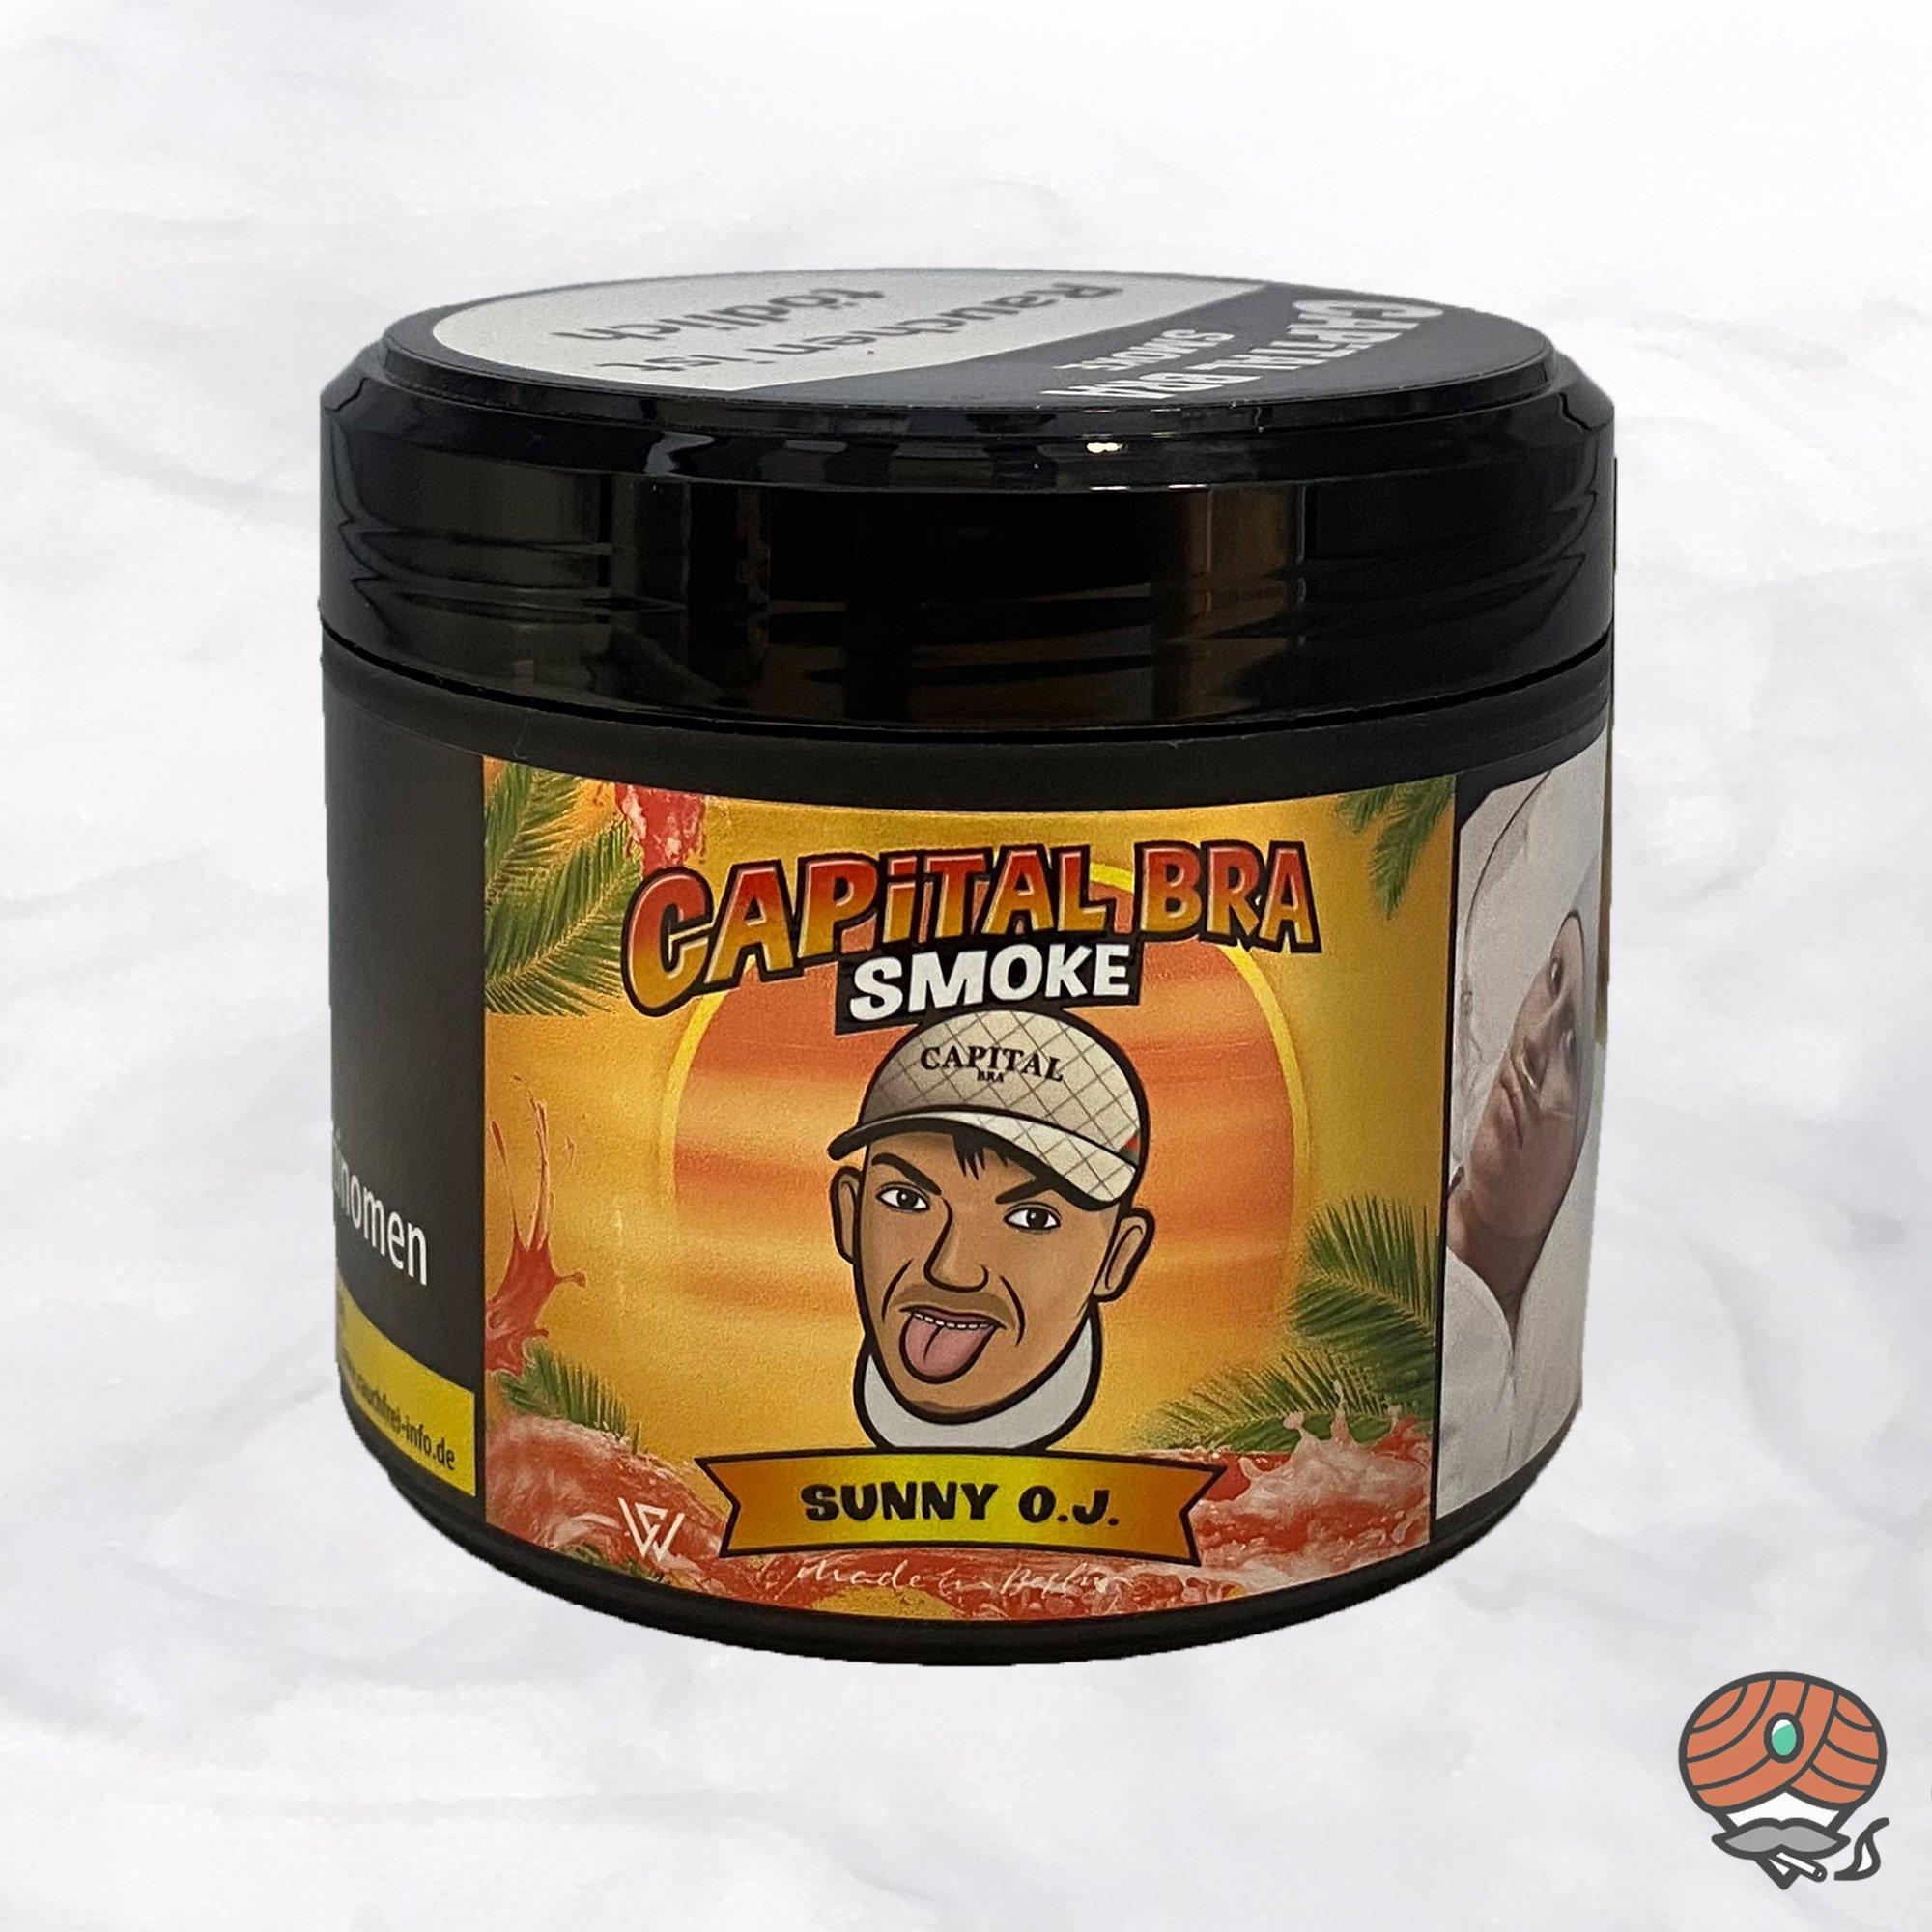 Capital Bra Smoke Shisha Tabak - Sunny O.J. 200g